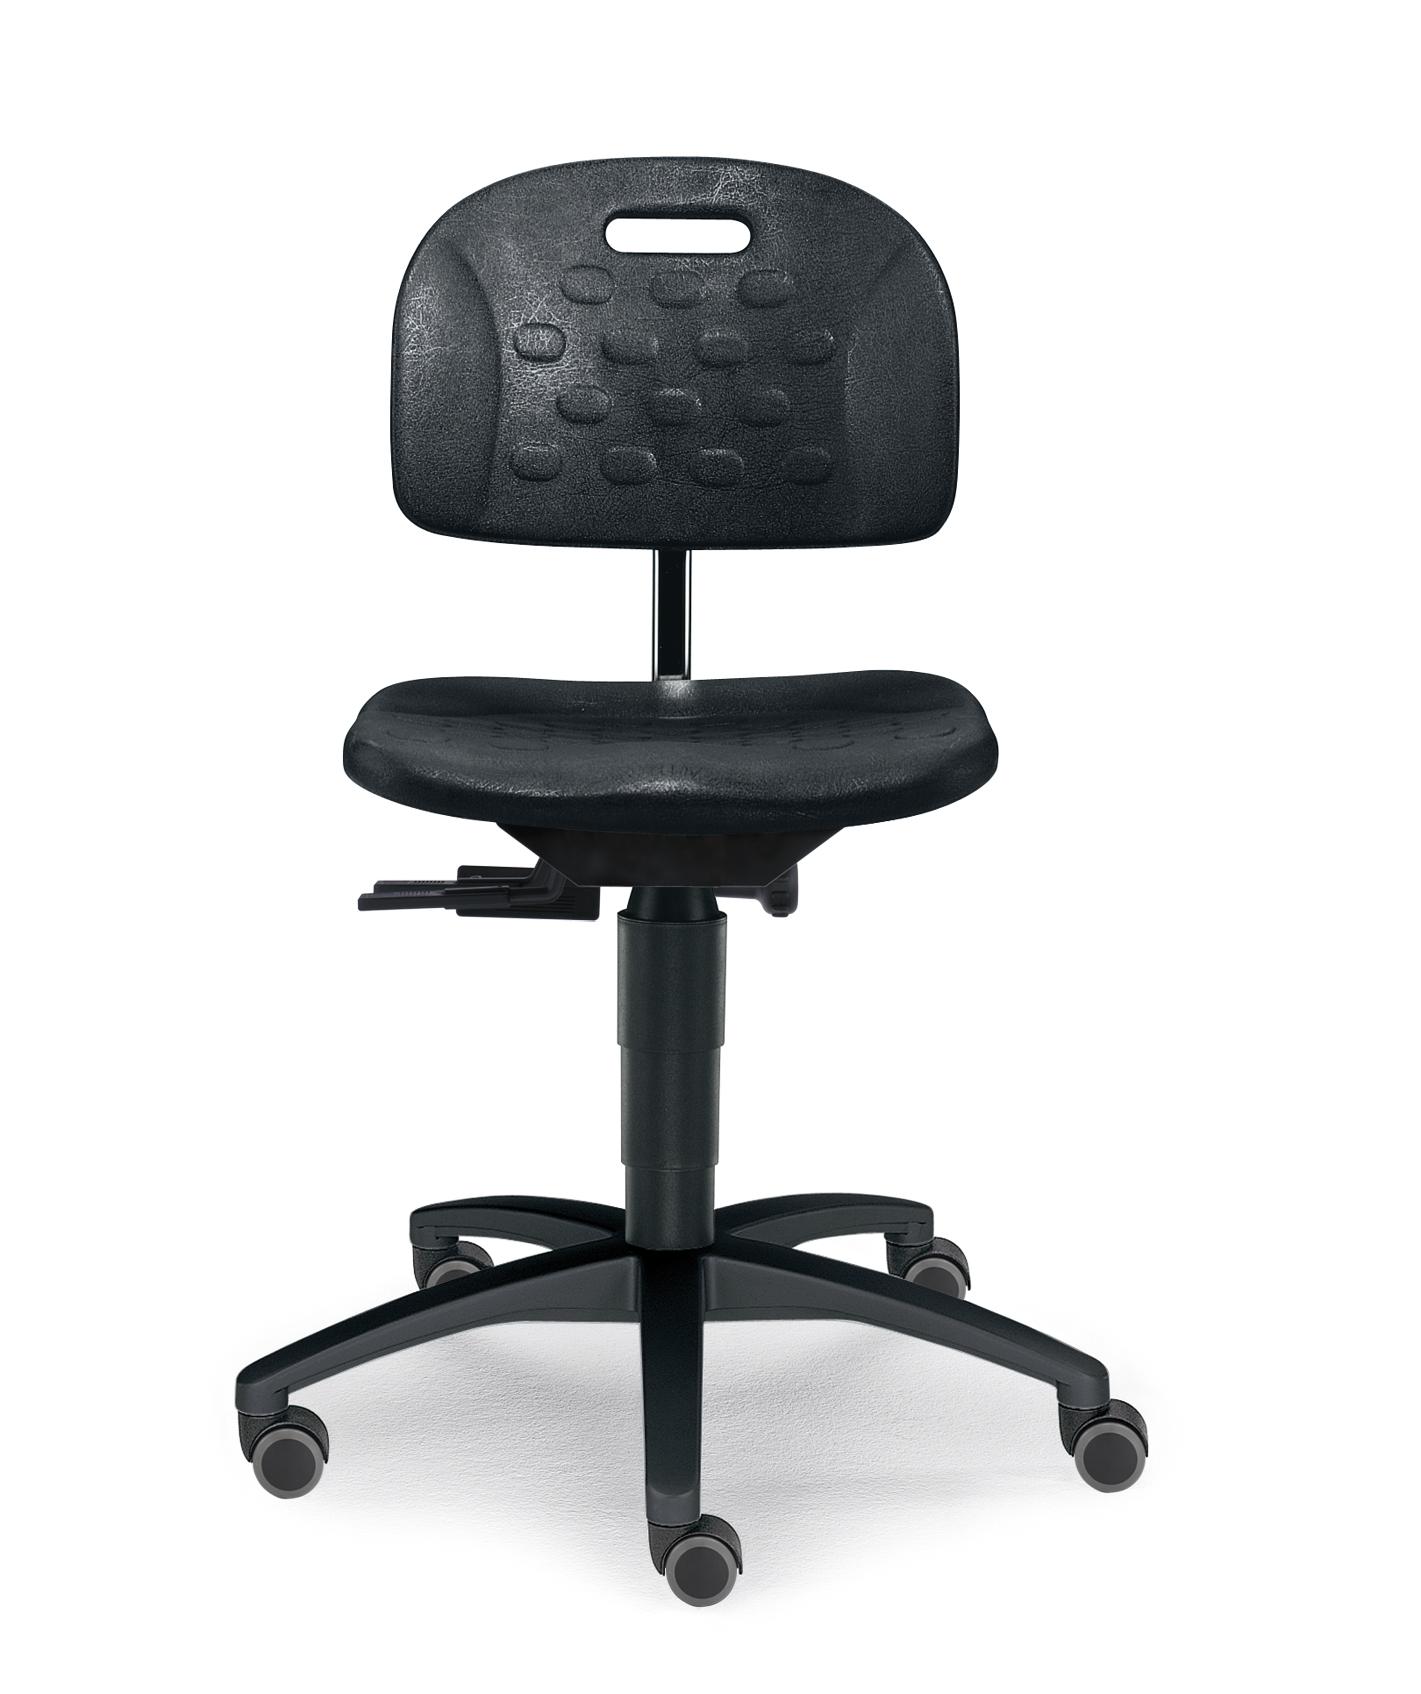 Standard-Stuhl PU Dauphin